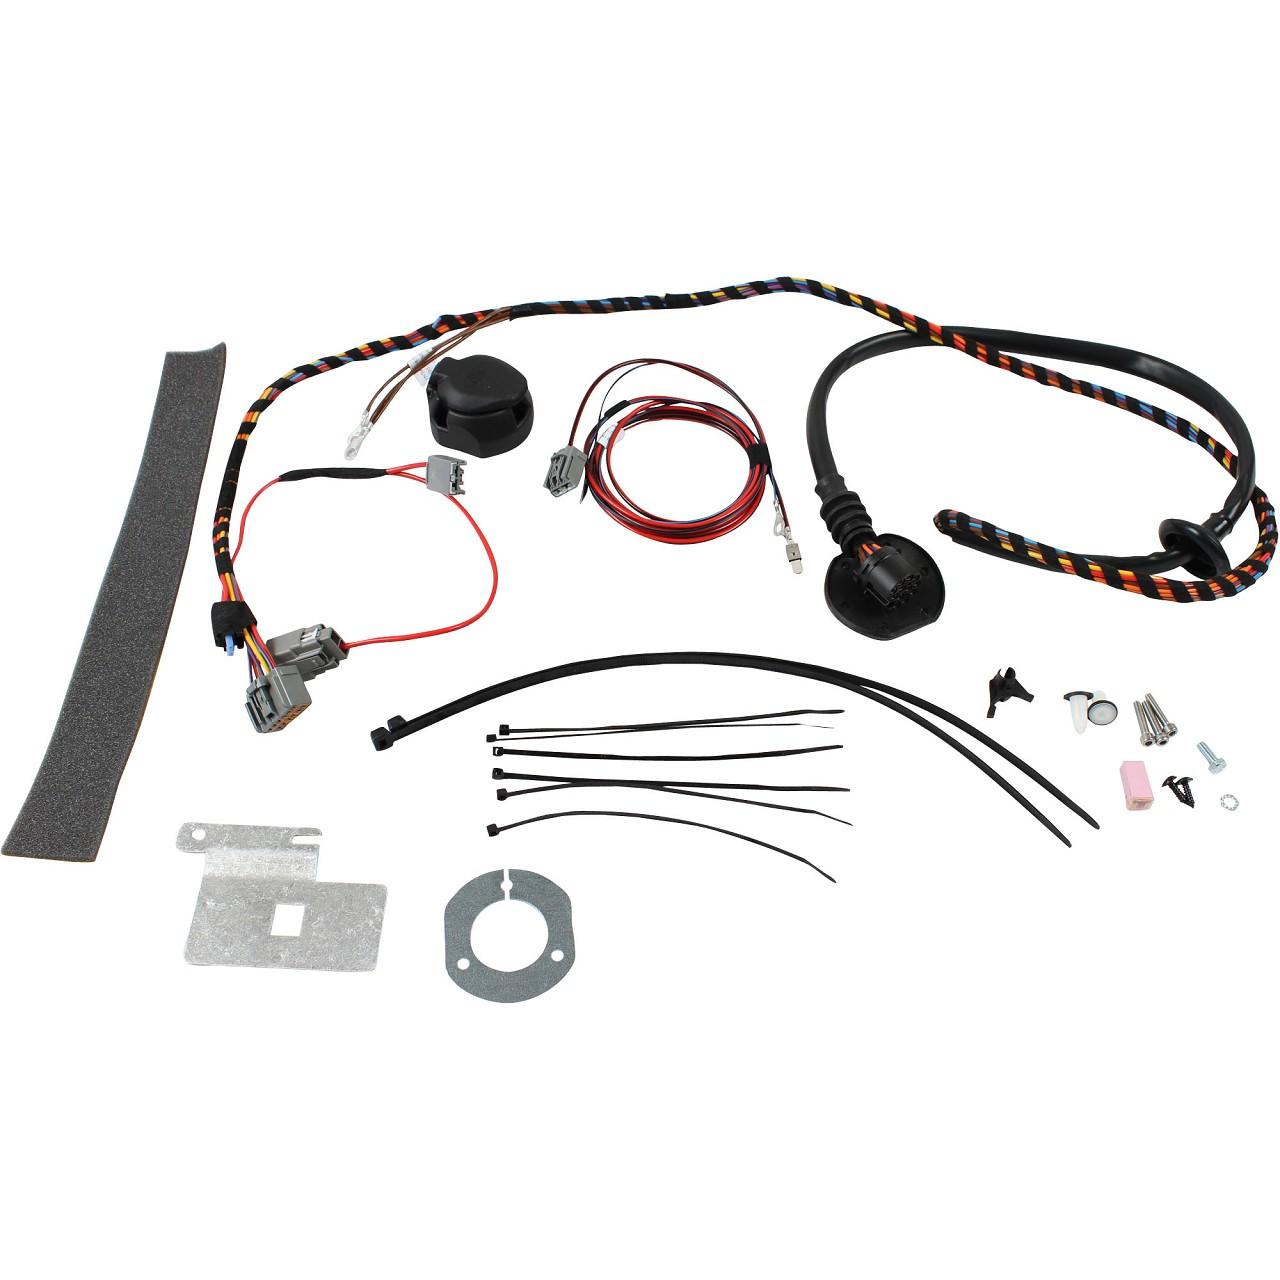 ORIGINAL Ford E-Satz Kabelsatz Anhängerkupplung Galaxy S-Max 13-polig 1742008